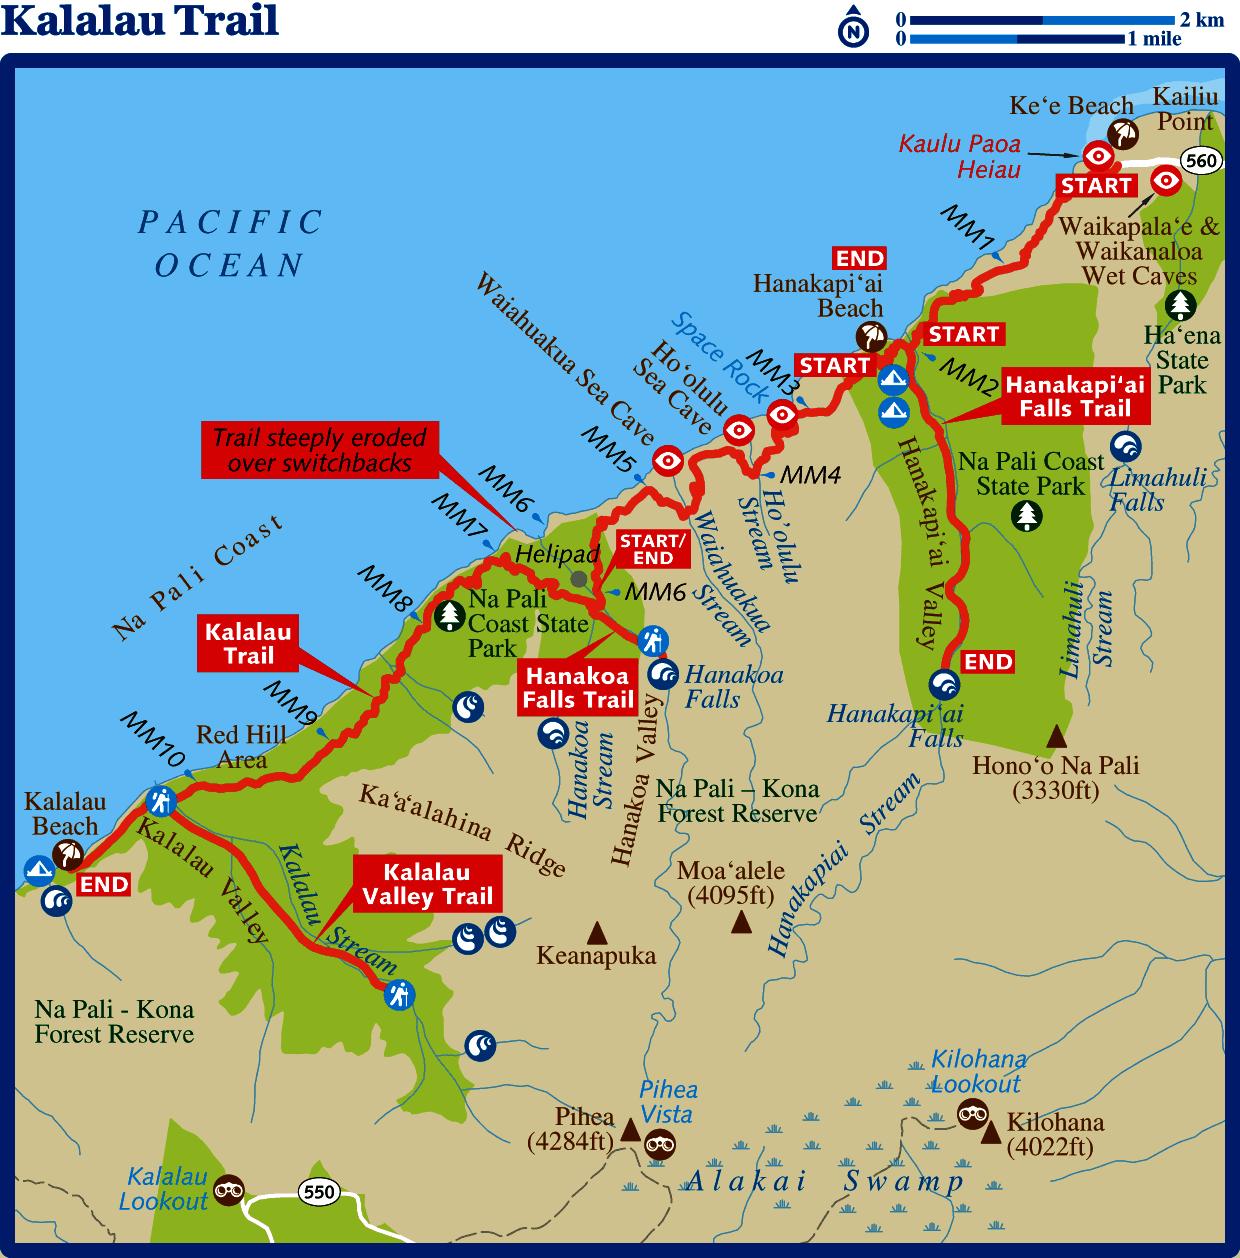 Cruise To Hawaii From California: Kalalau Trail « Sunfellow Productions • Sedona, Arizona